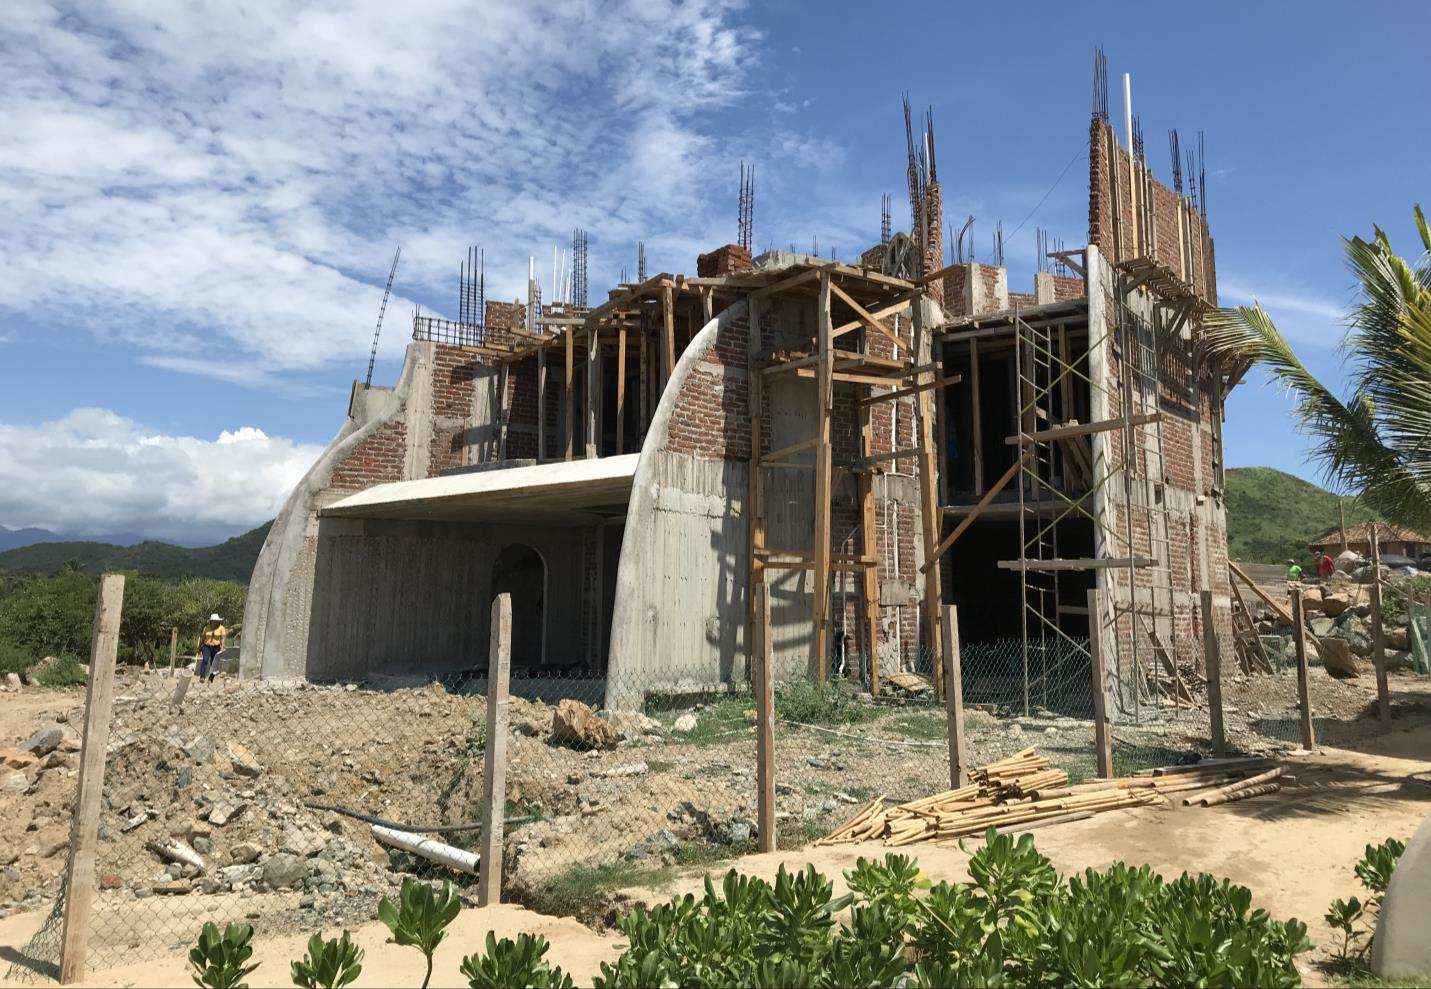 REPORTE-FOTOGRAFICO-PUNTA-MAJAHUA-29-SEPTIEMBRE-DEL-2018-014.jpg